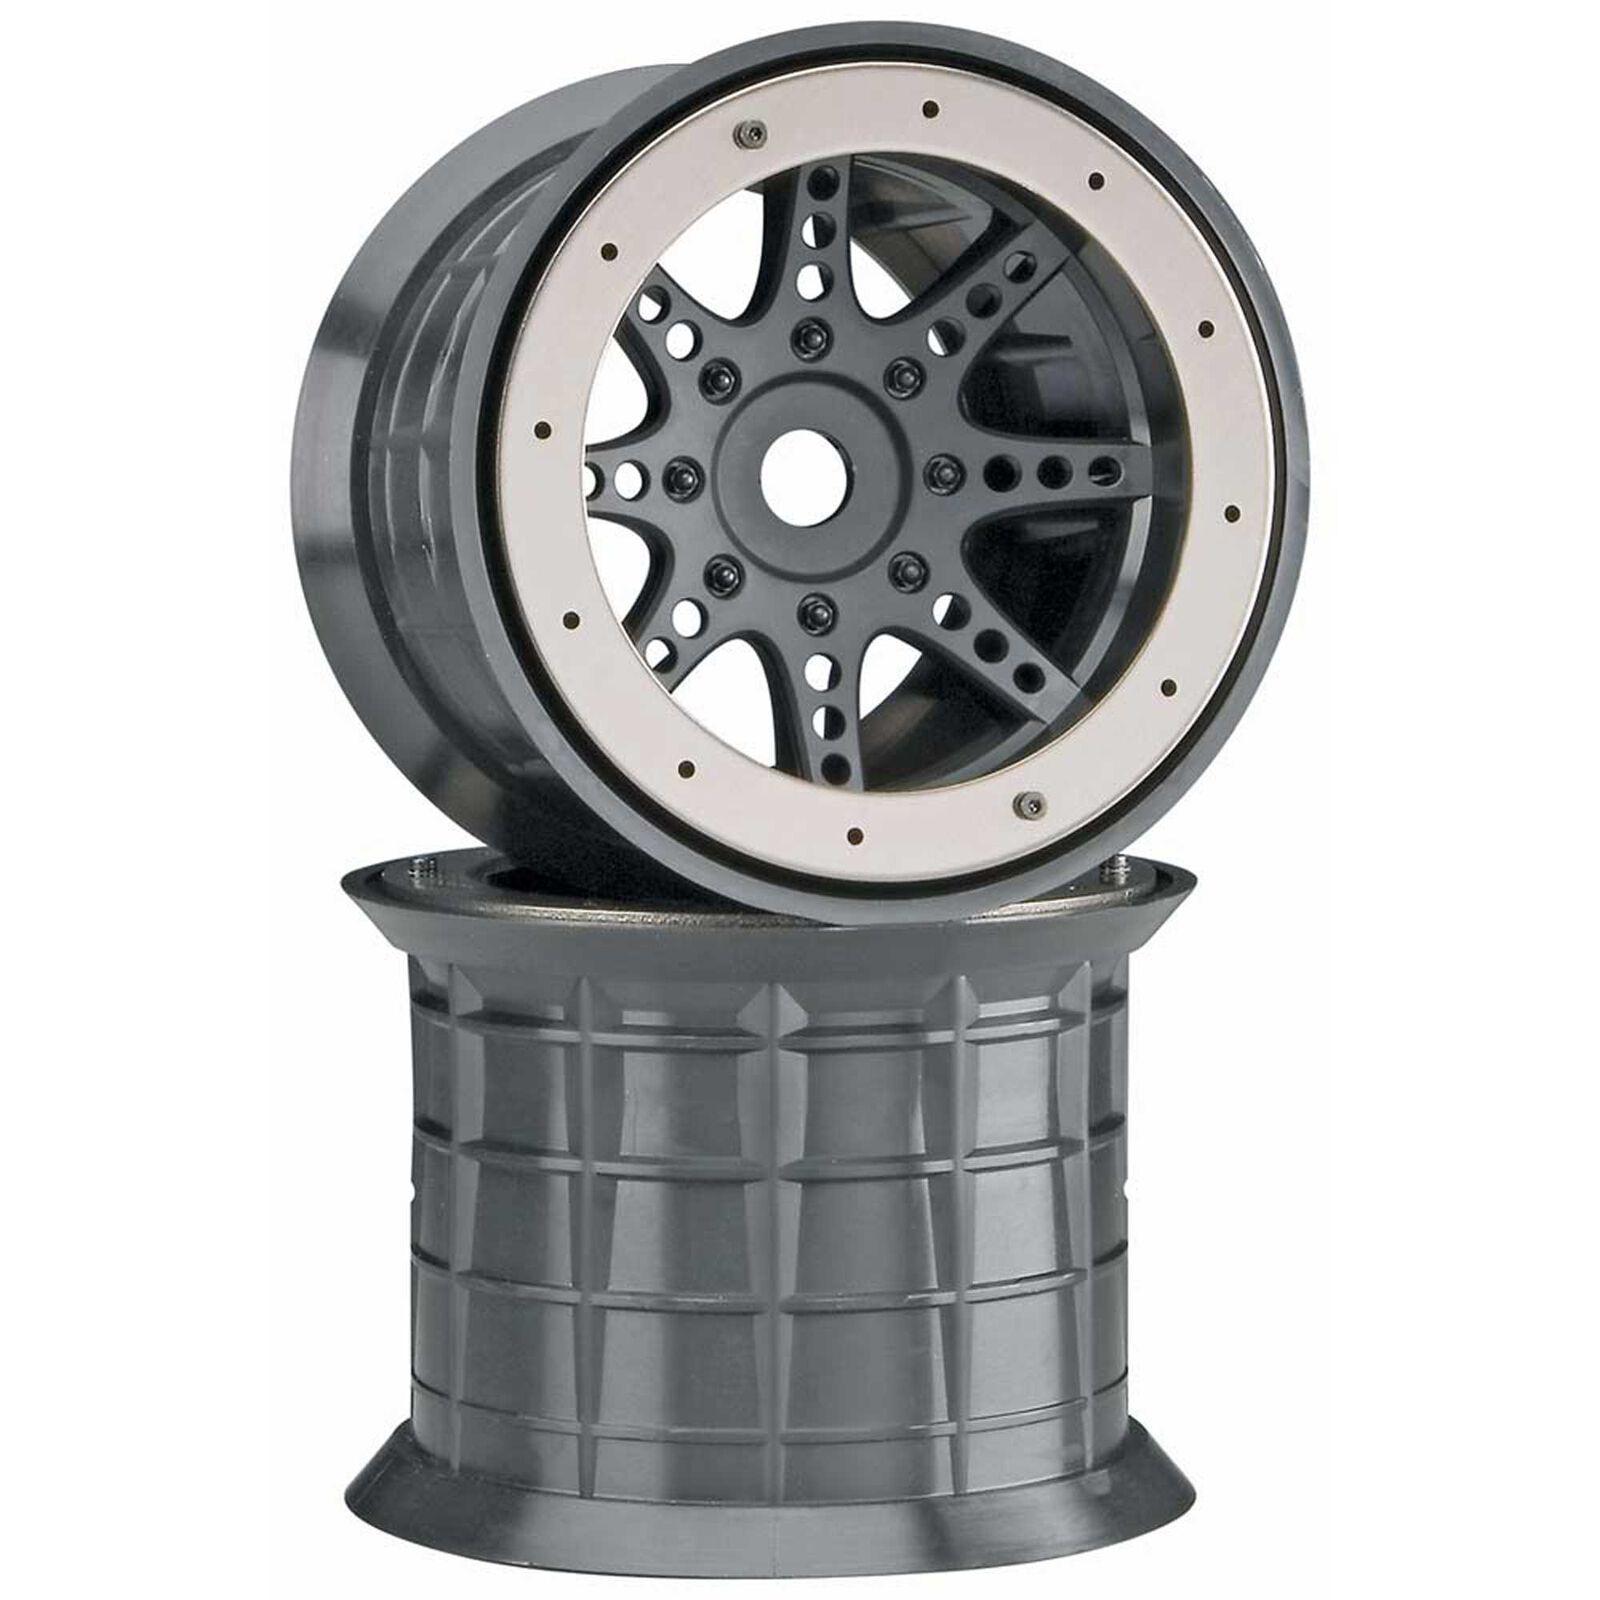 1/8 Oversize 8-Spoke 3.8 Beadlock Wheels, 17mm Hex, Black (2)